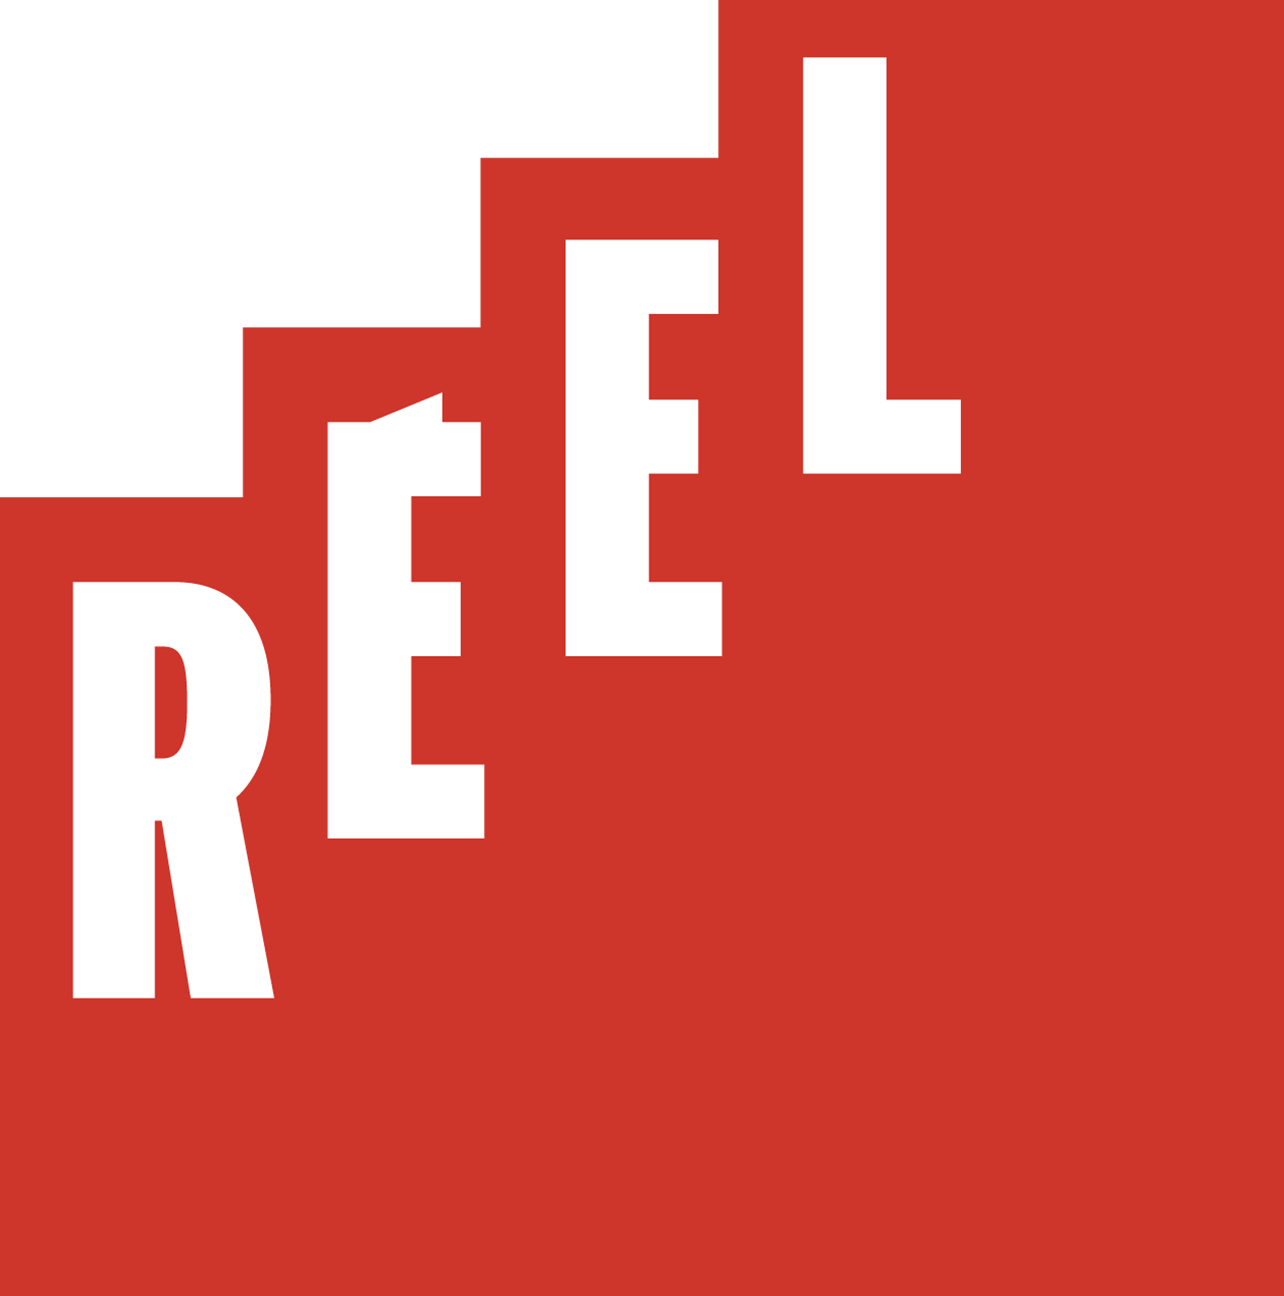 Logo RÉEL